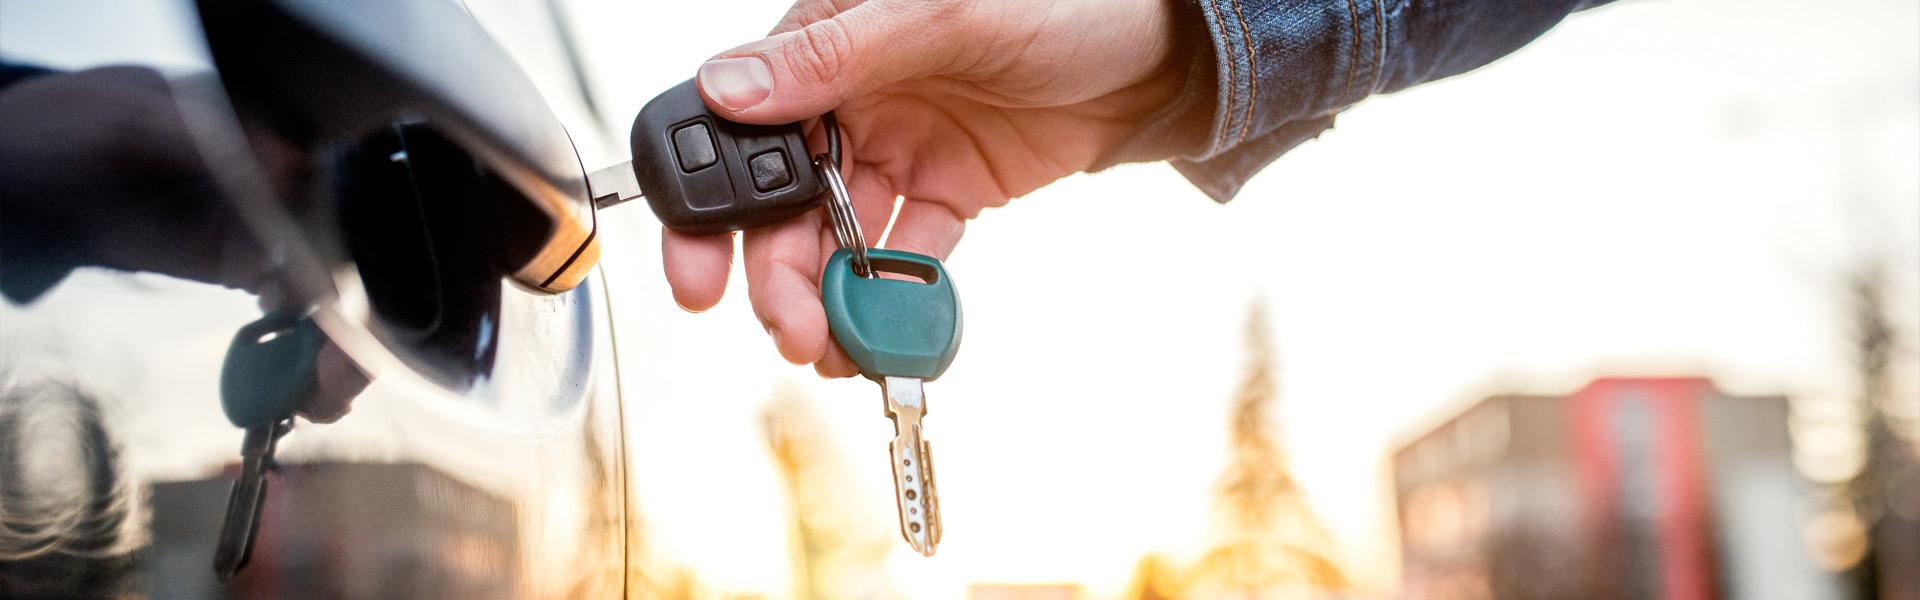 Atlanta Rental Car Accident Attorney